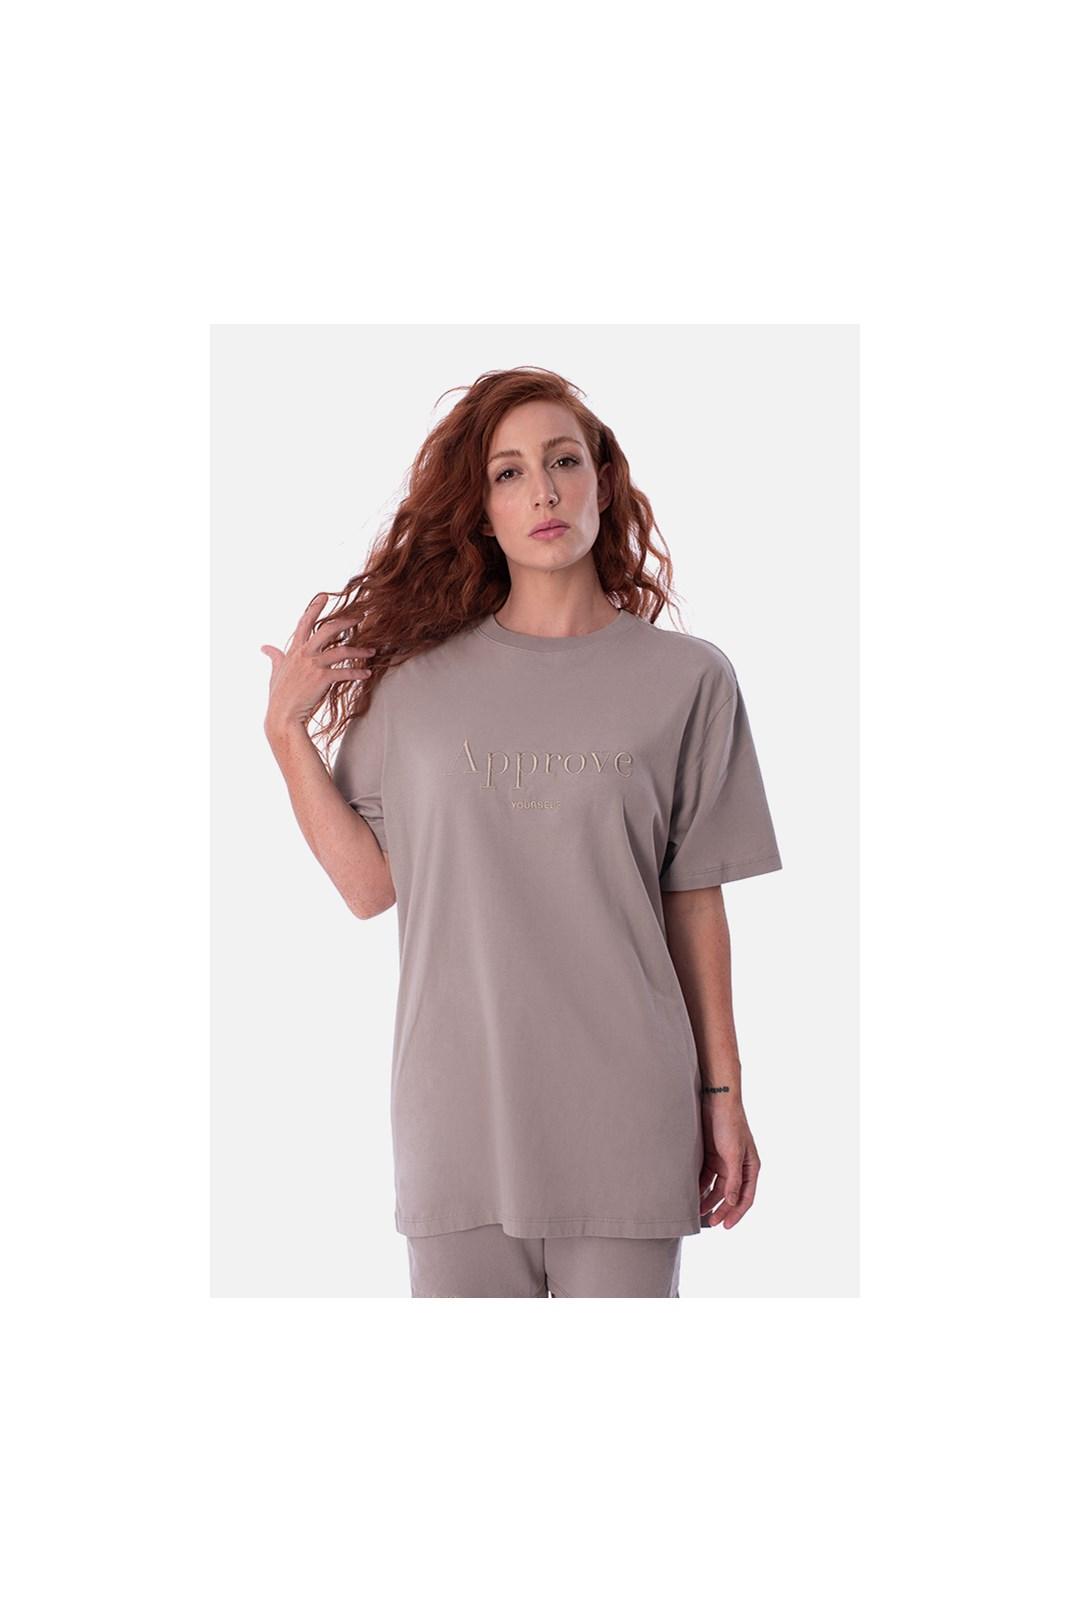 Camiseta Bold Approve Monochromatic Bege